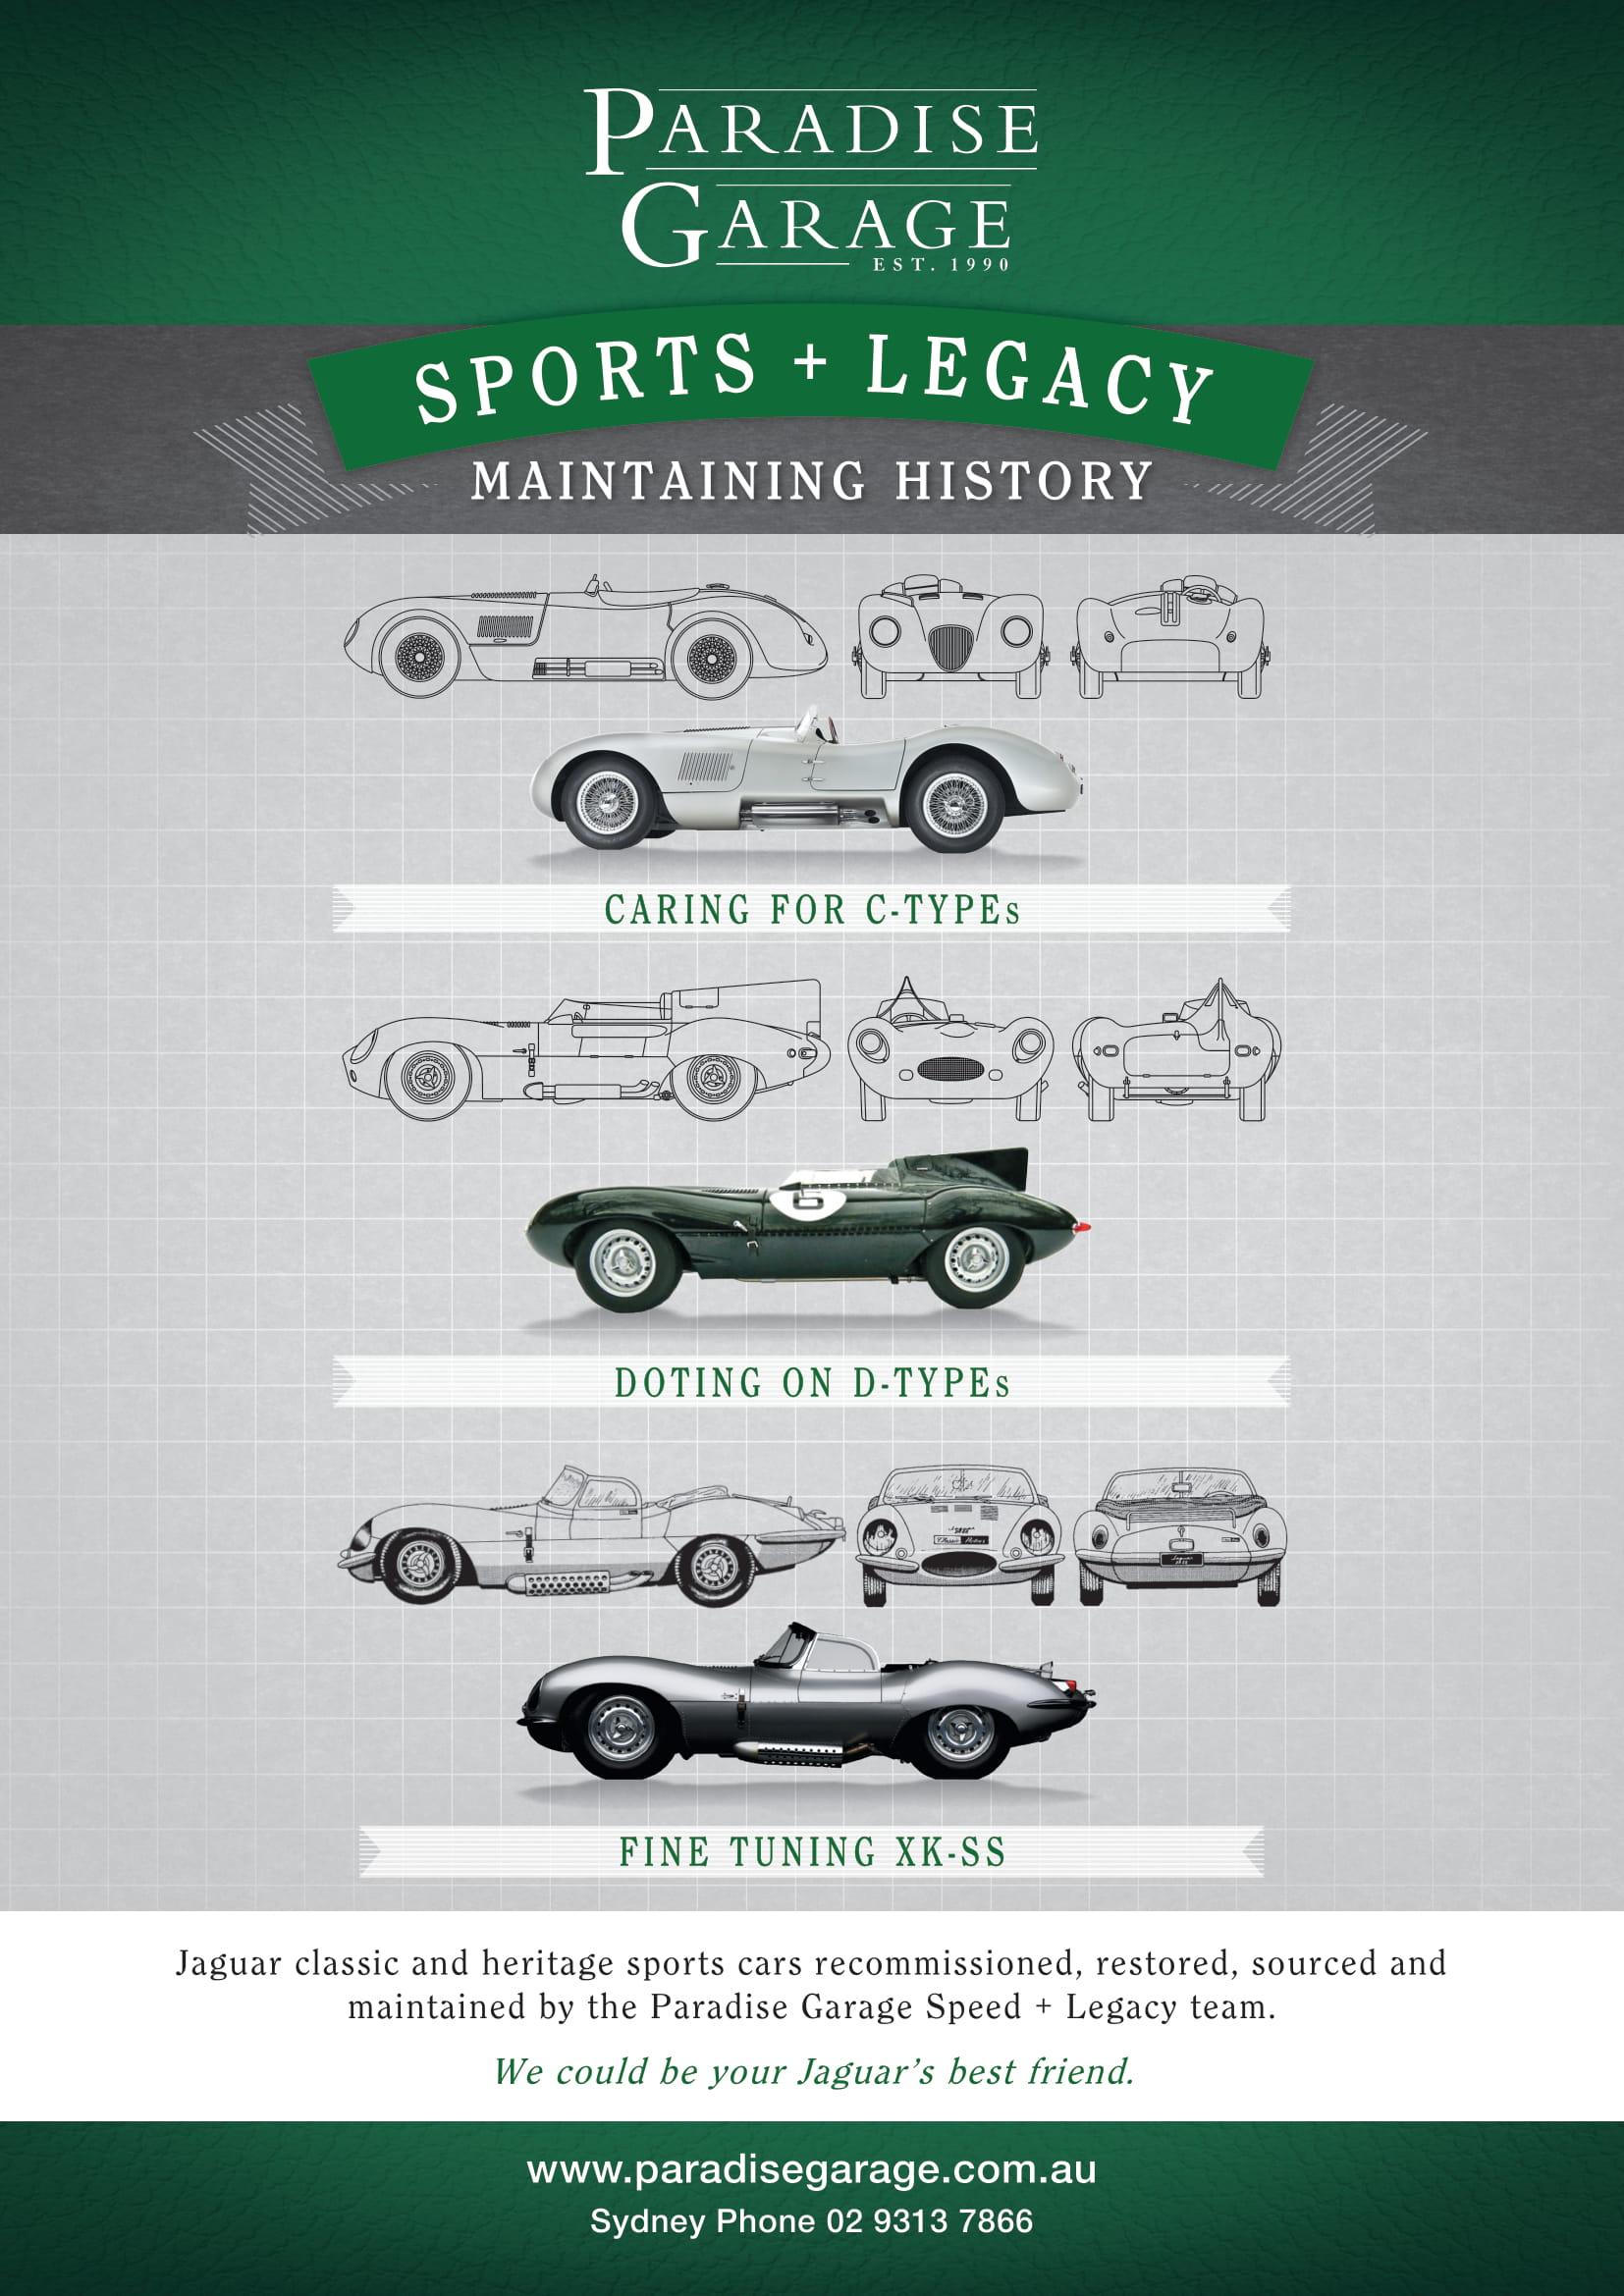 Paradise-Garage-Heritage-Jaguar-Speed-+-Legacy-Jaguar-C-D-XKSS-Maintaining-History